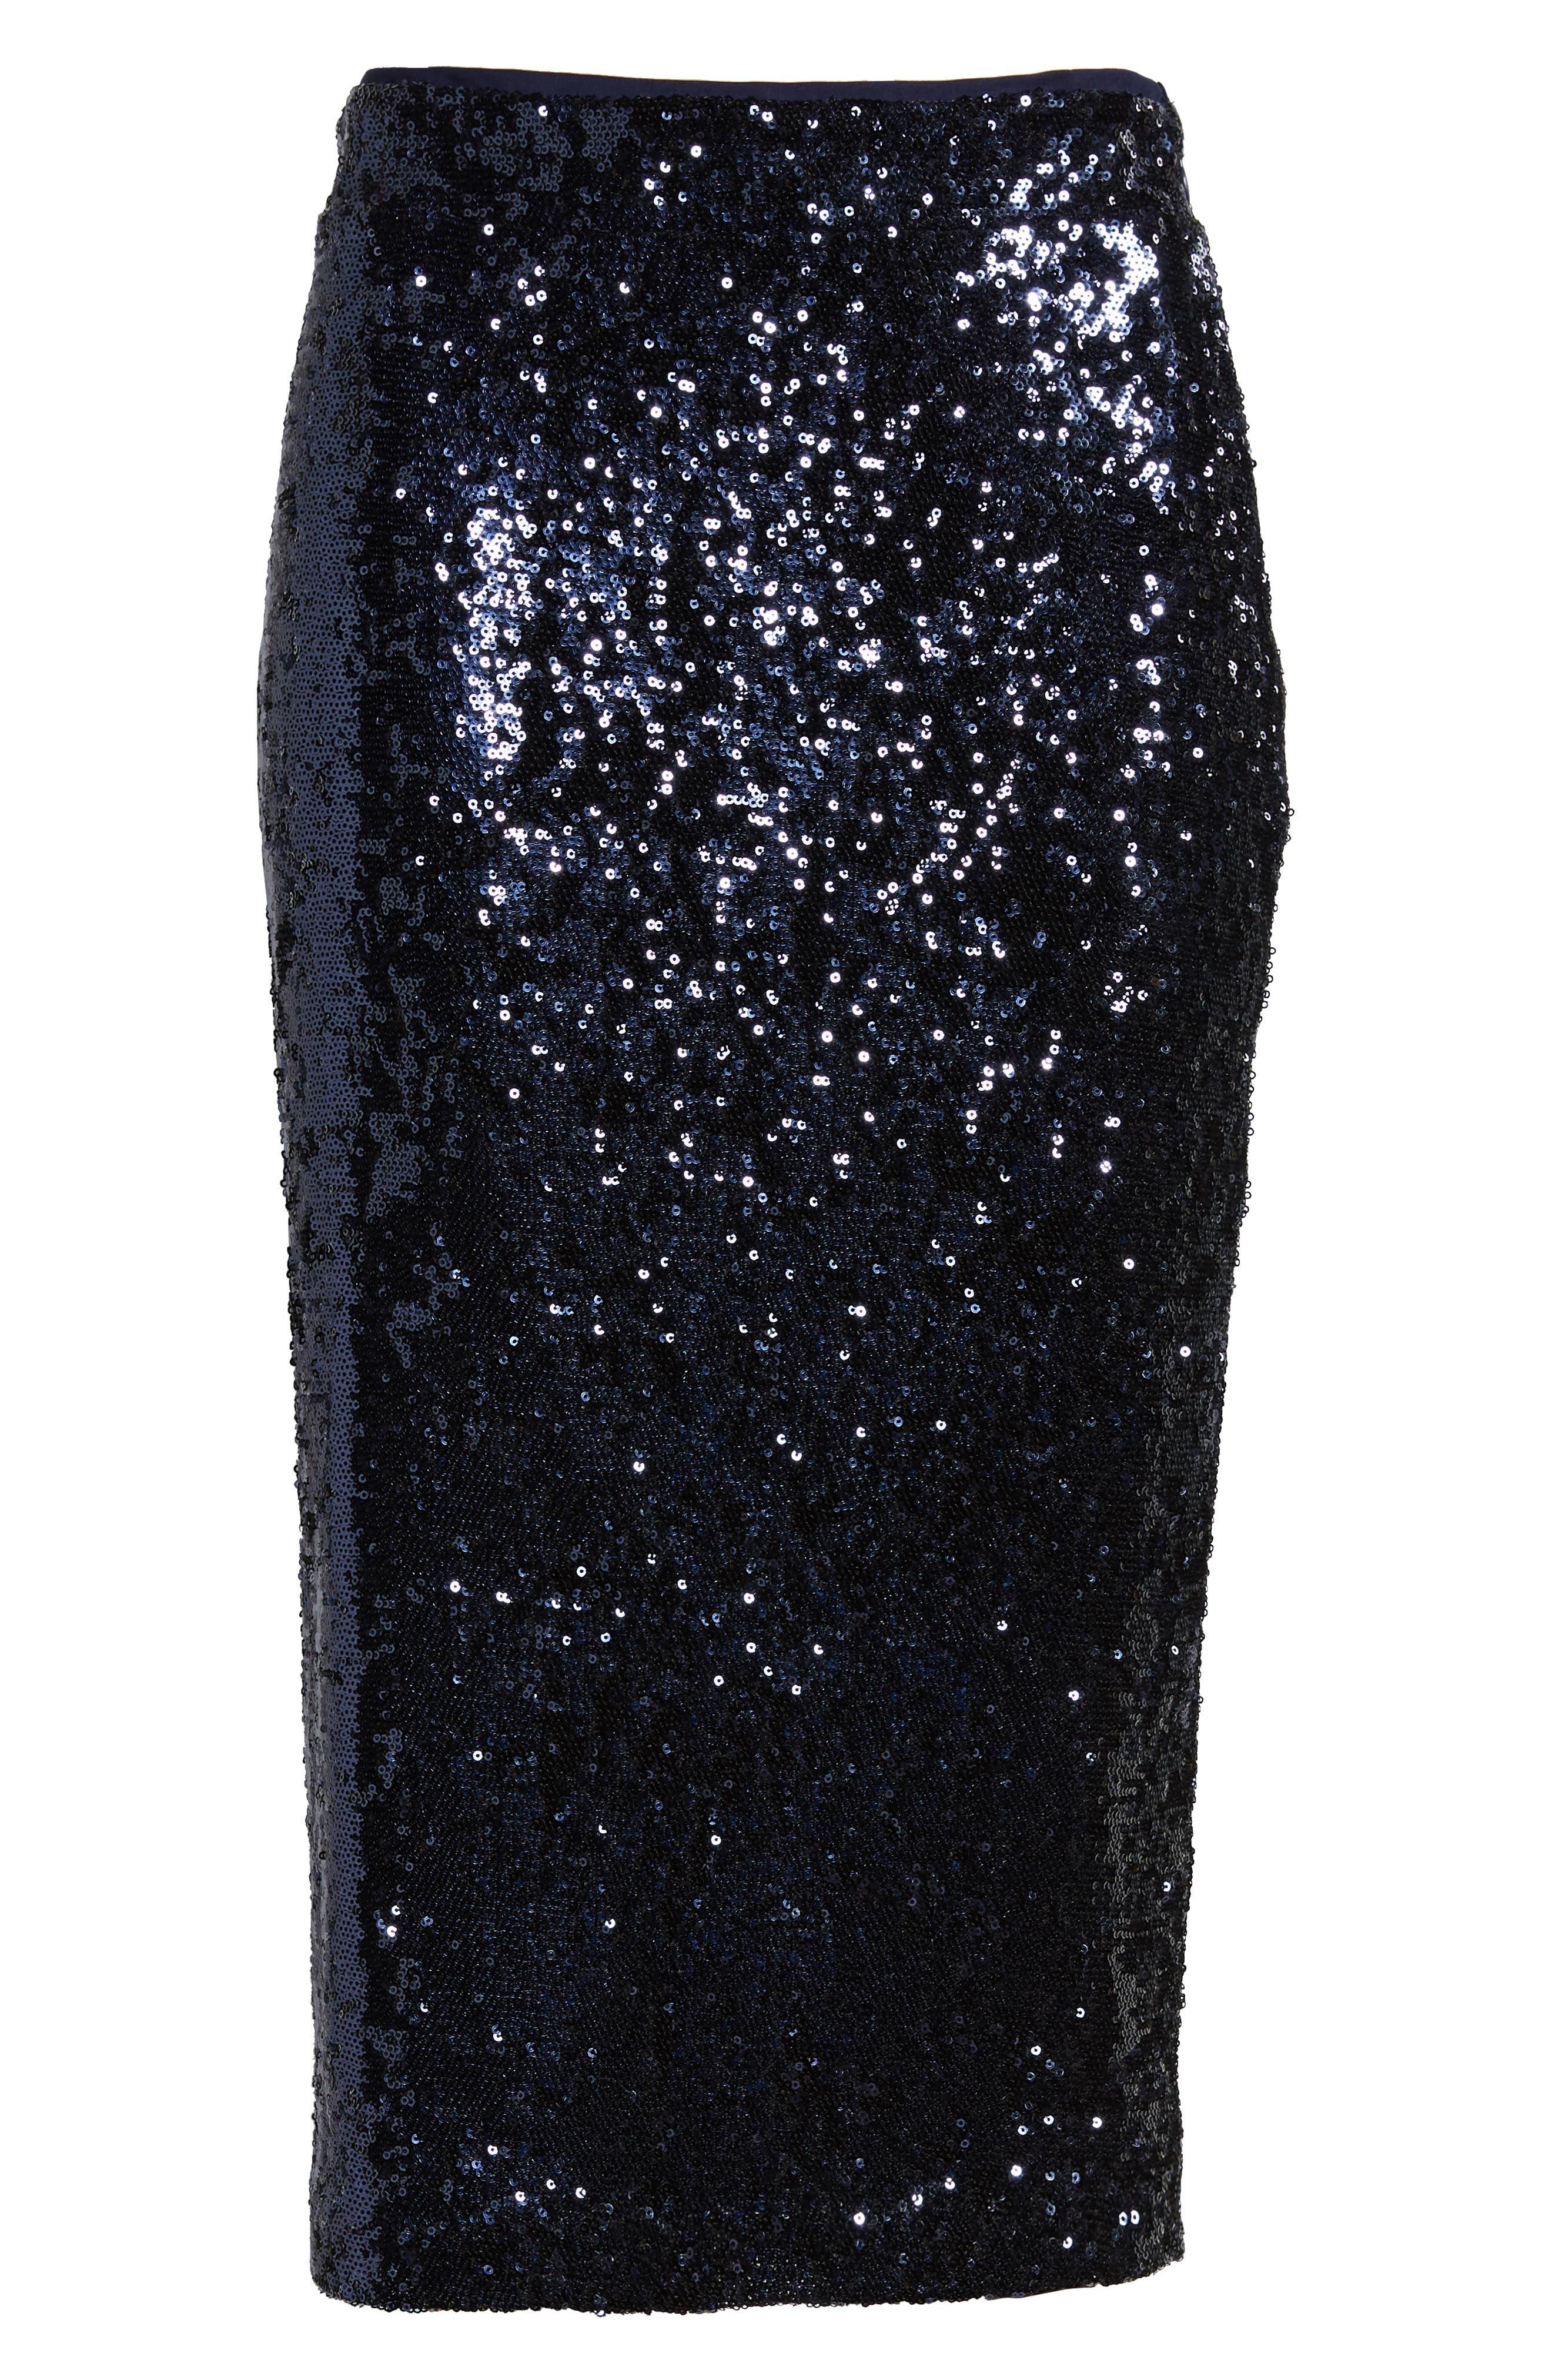 Sequin Pencil Skirt,                             Alternate thumbnail 6, color,                             NAVY MINI SEQUINS